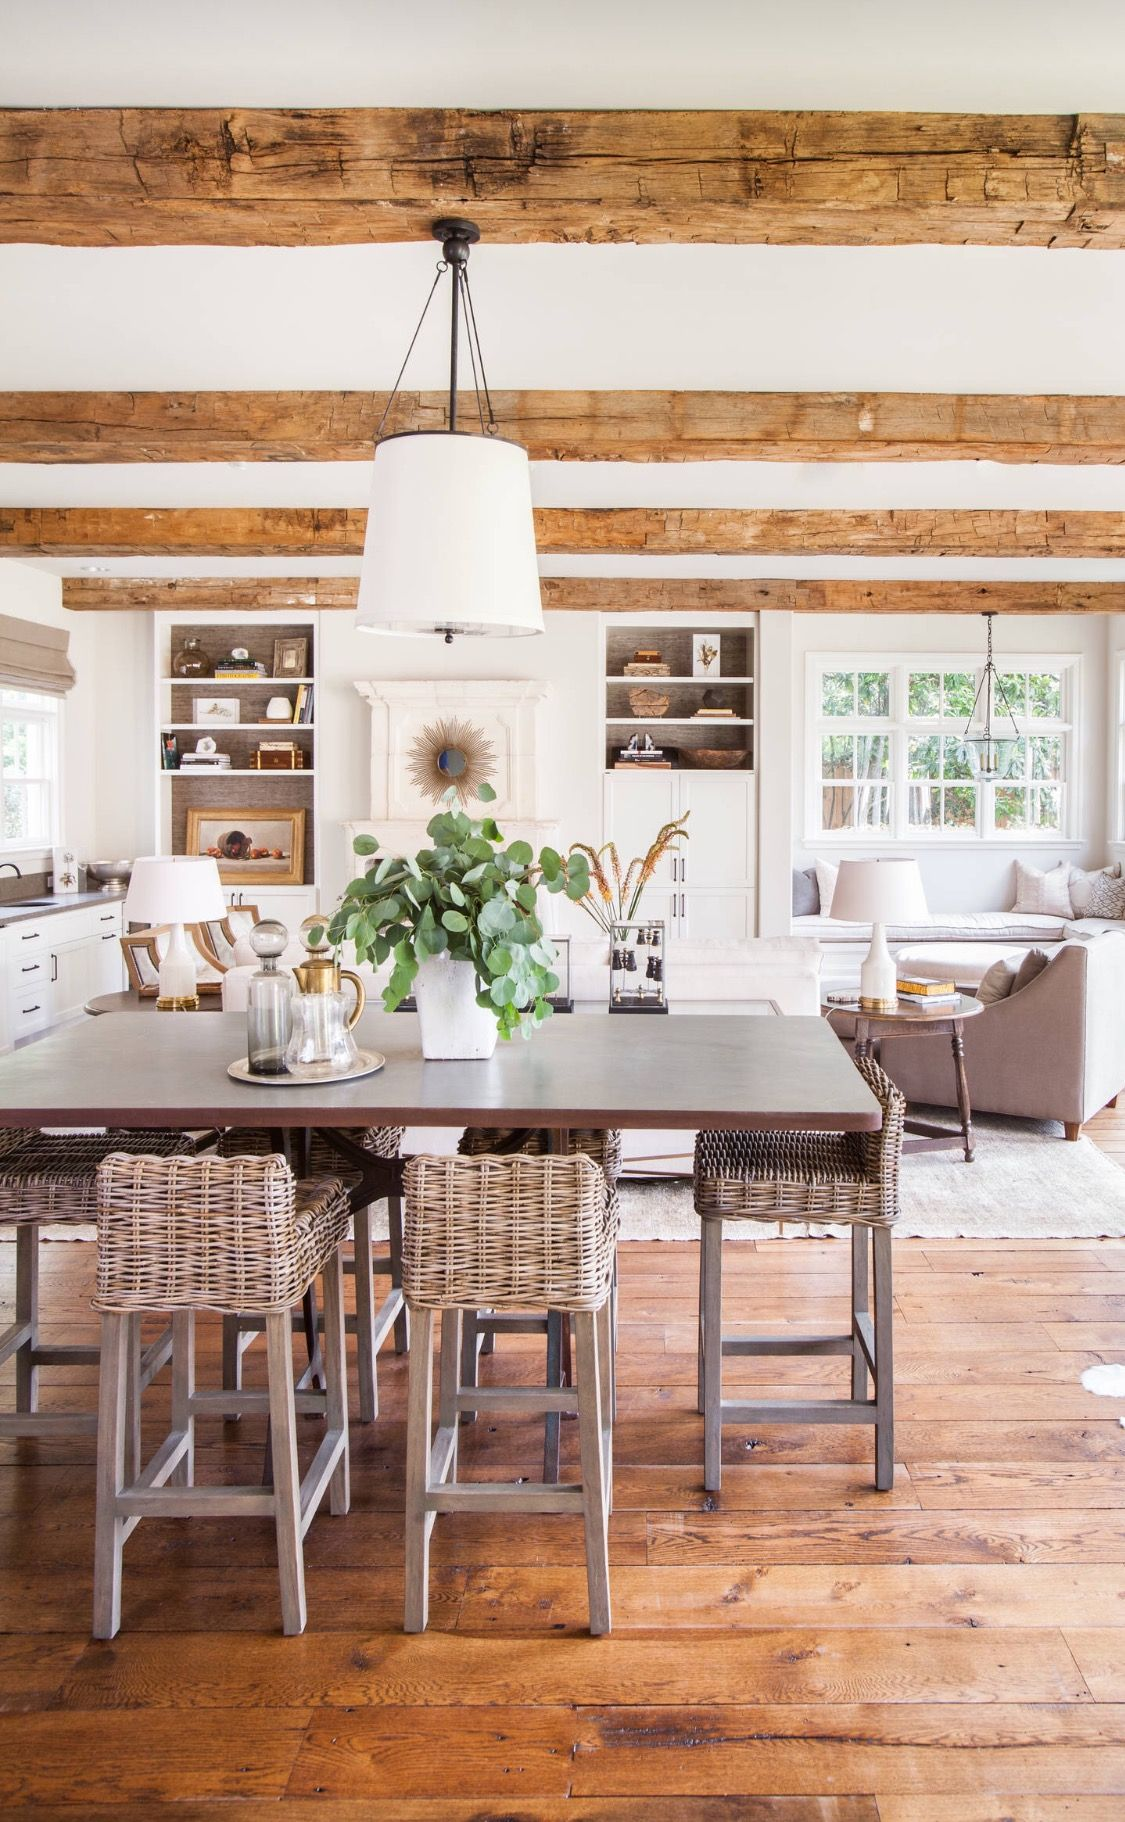 beautiful rustic kitchen houzz farmhouse interior design modern farmhouse dining room on kitchen interior farmhouse id=36446